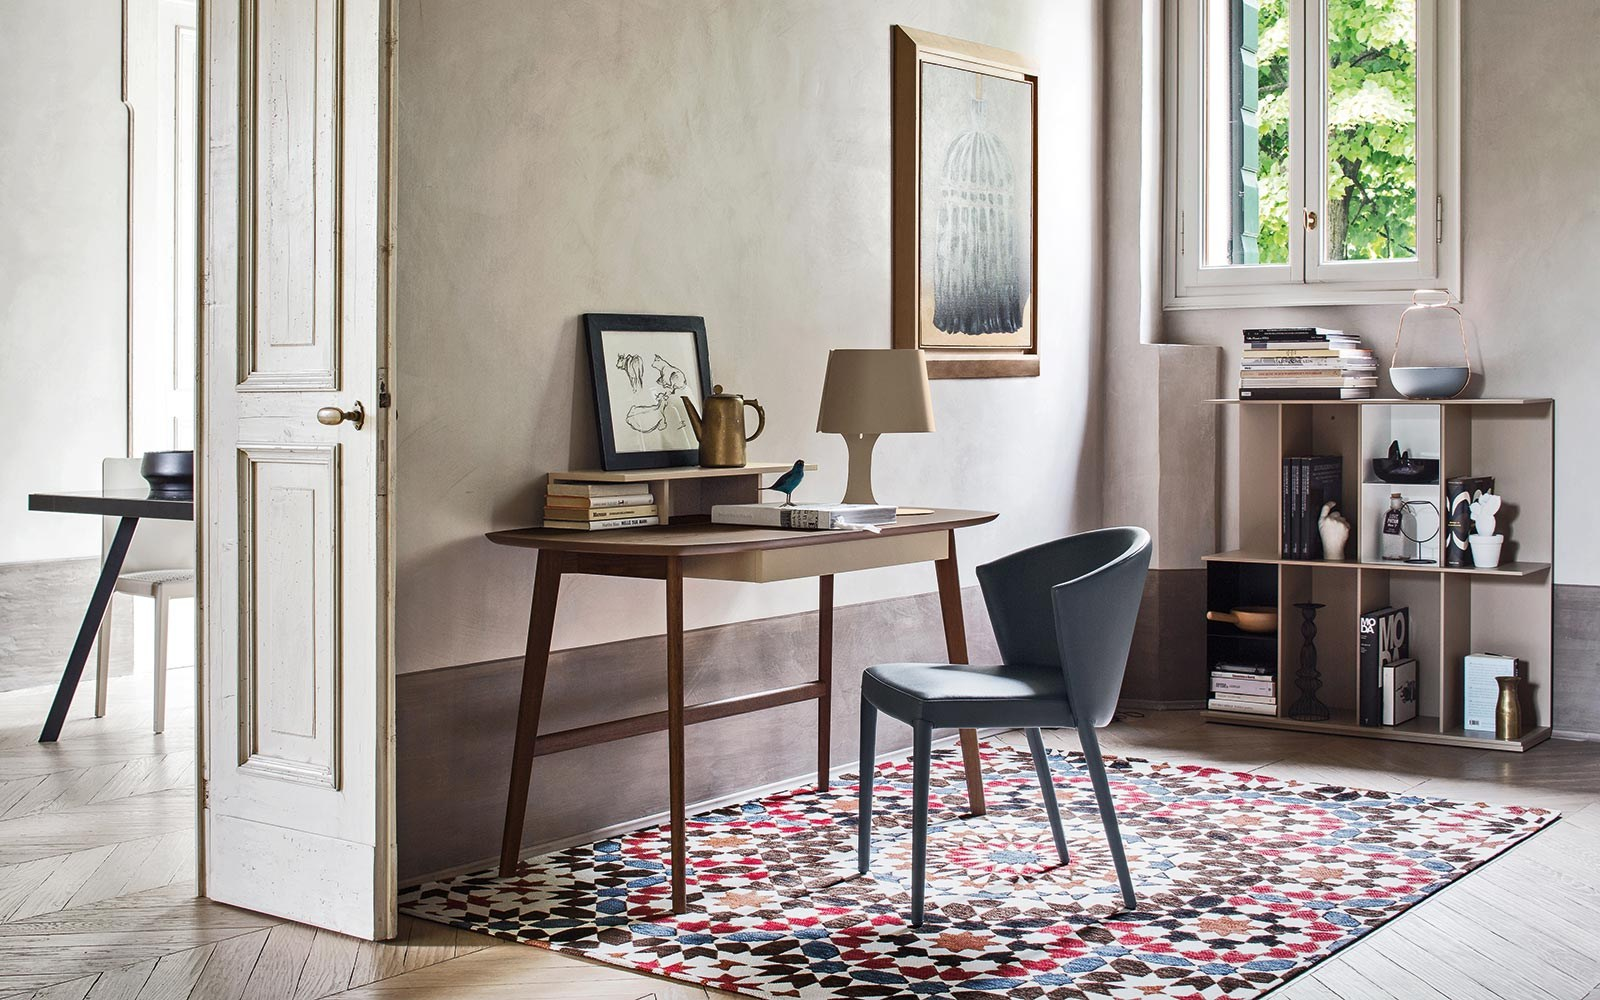 MATCH Writing desk by Calligaris design Gino Carollo